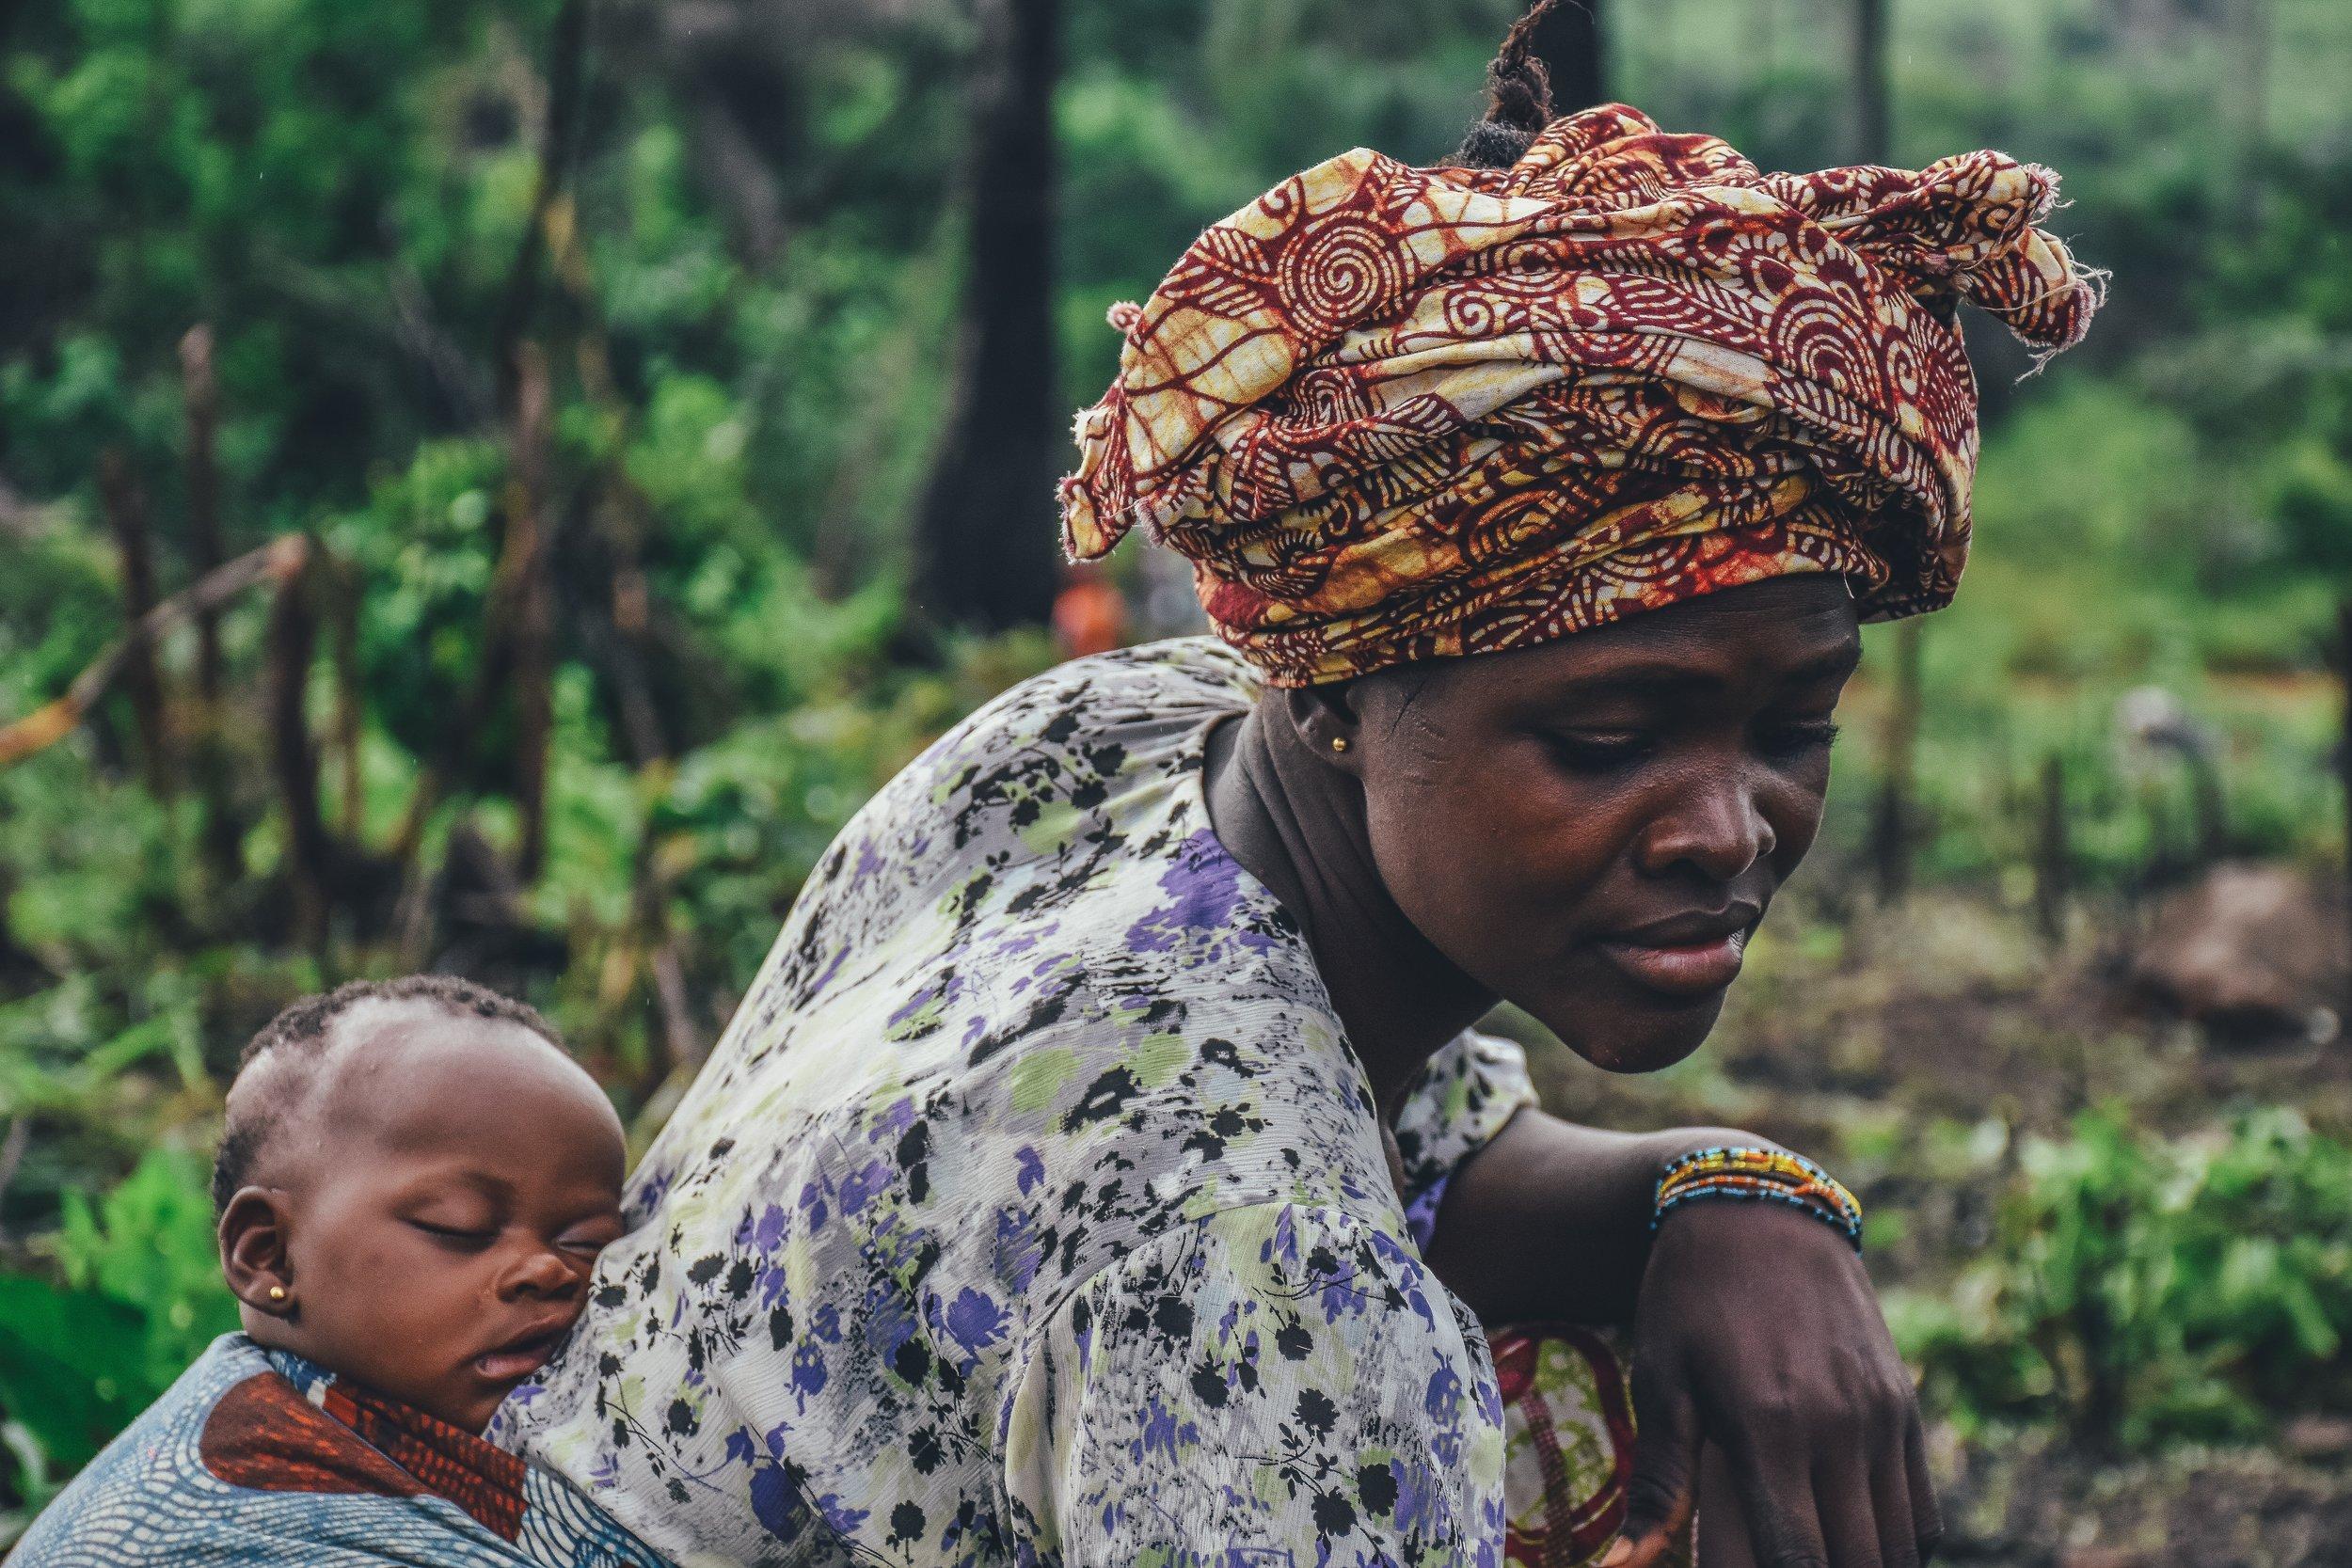 Mother & daughter in Sierra Leone